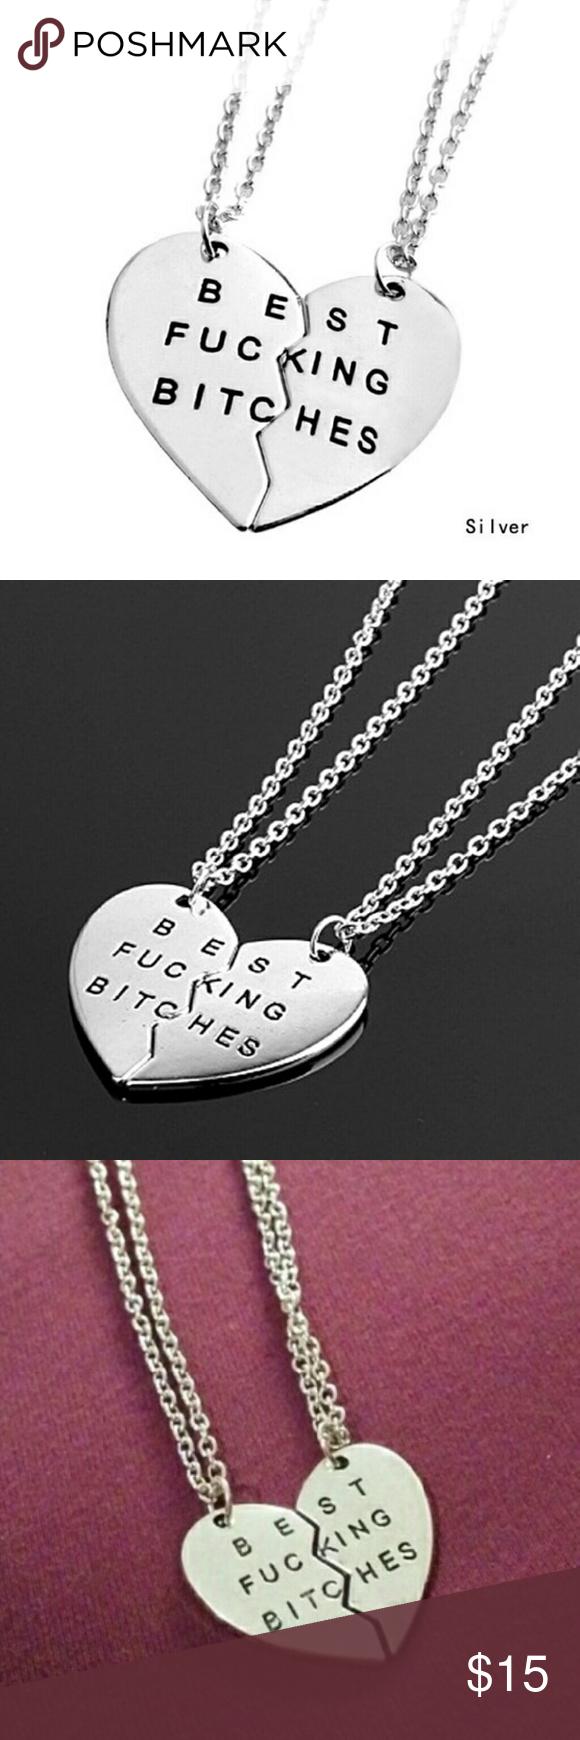 Best bitches 2 piece heart necklace boutique heart pendant best bitches 2 piece heart necklace boutique mozeypictures Image collections